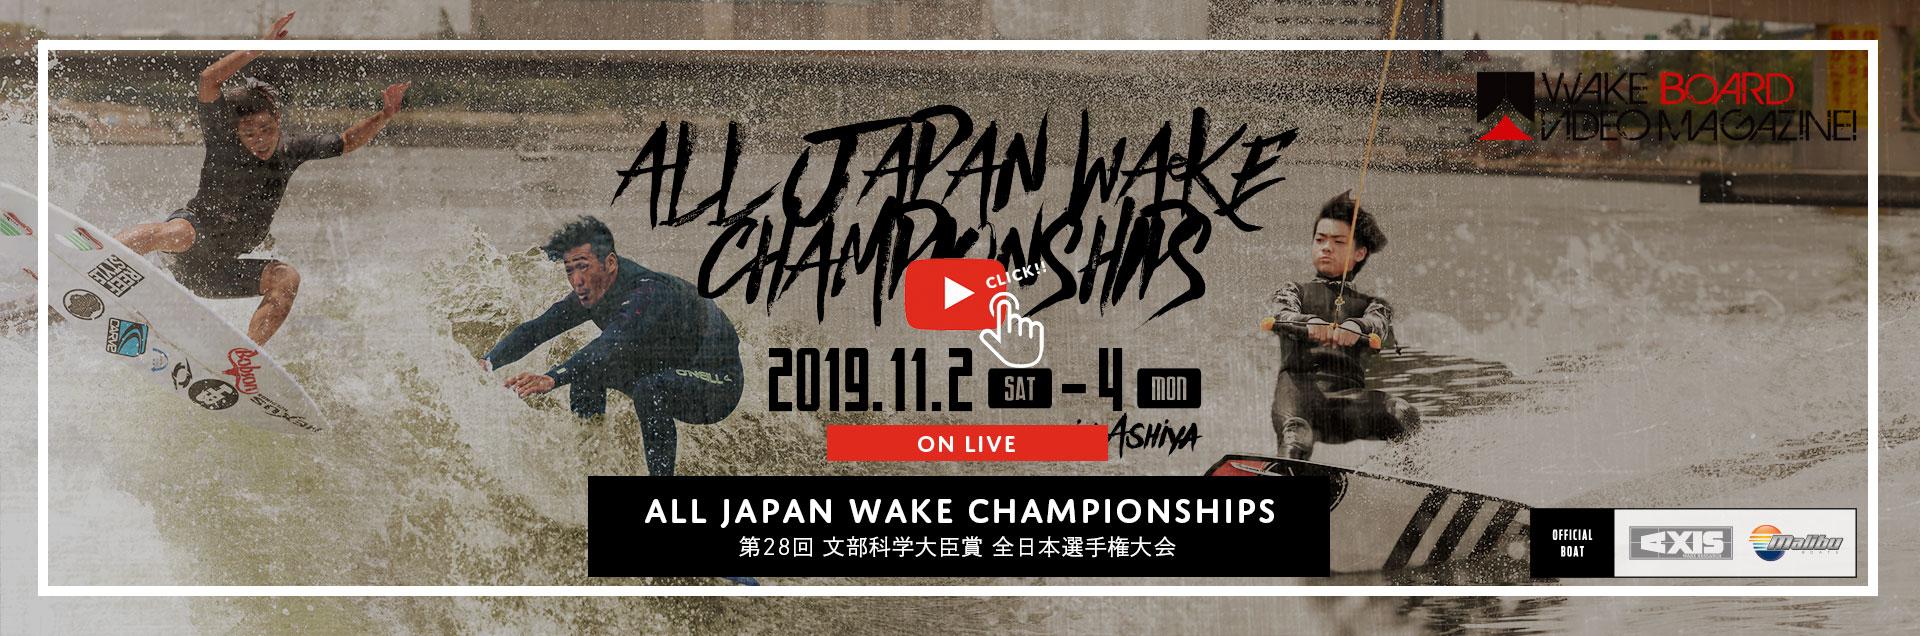 2019_all_japan_wake_championships_002